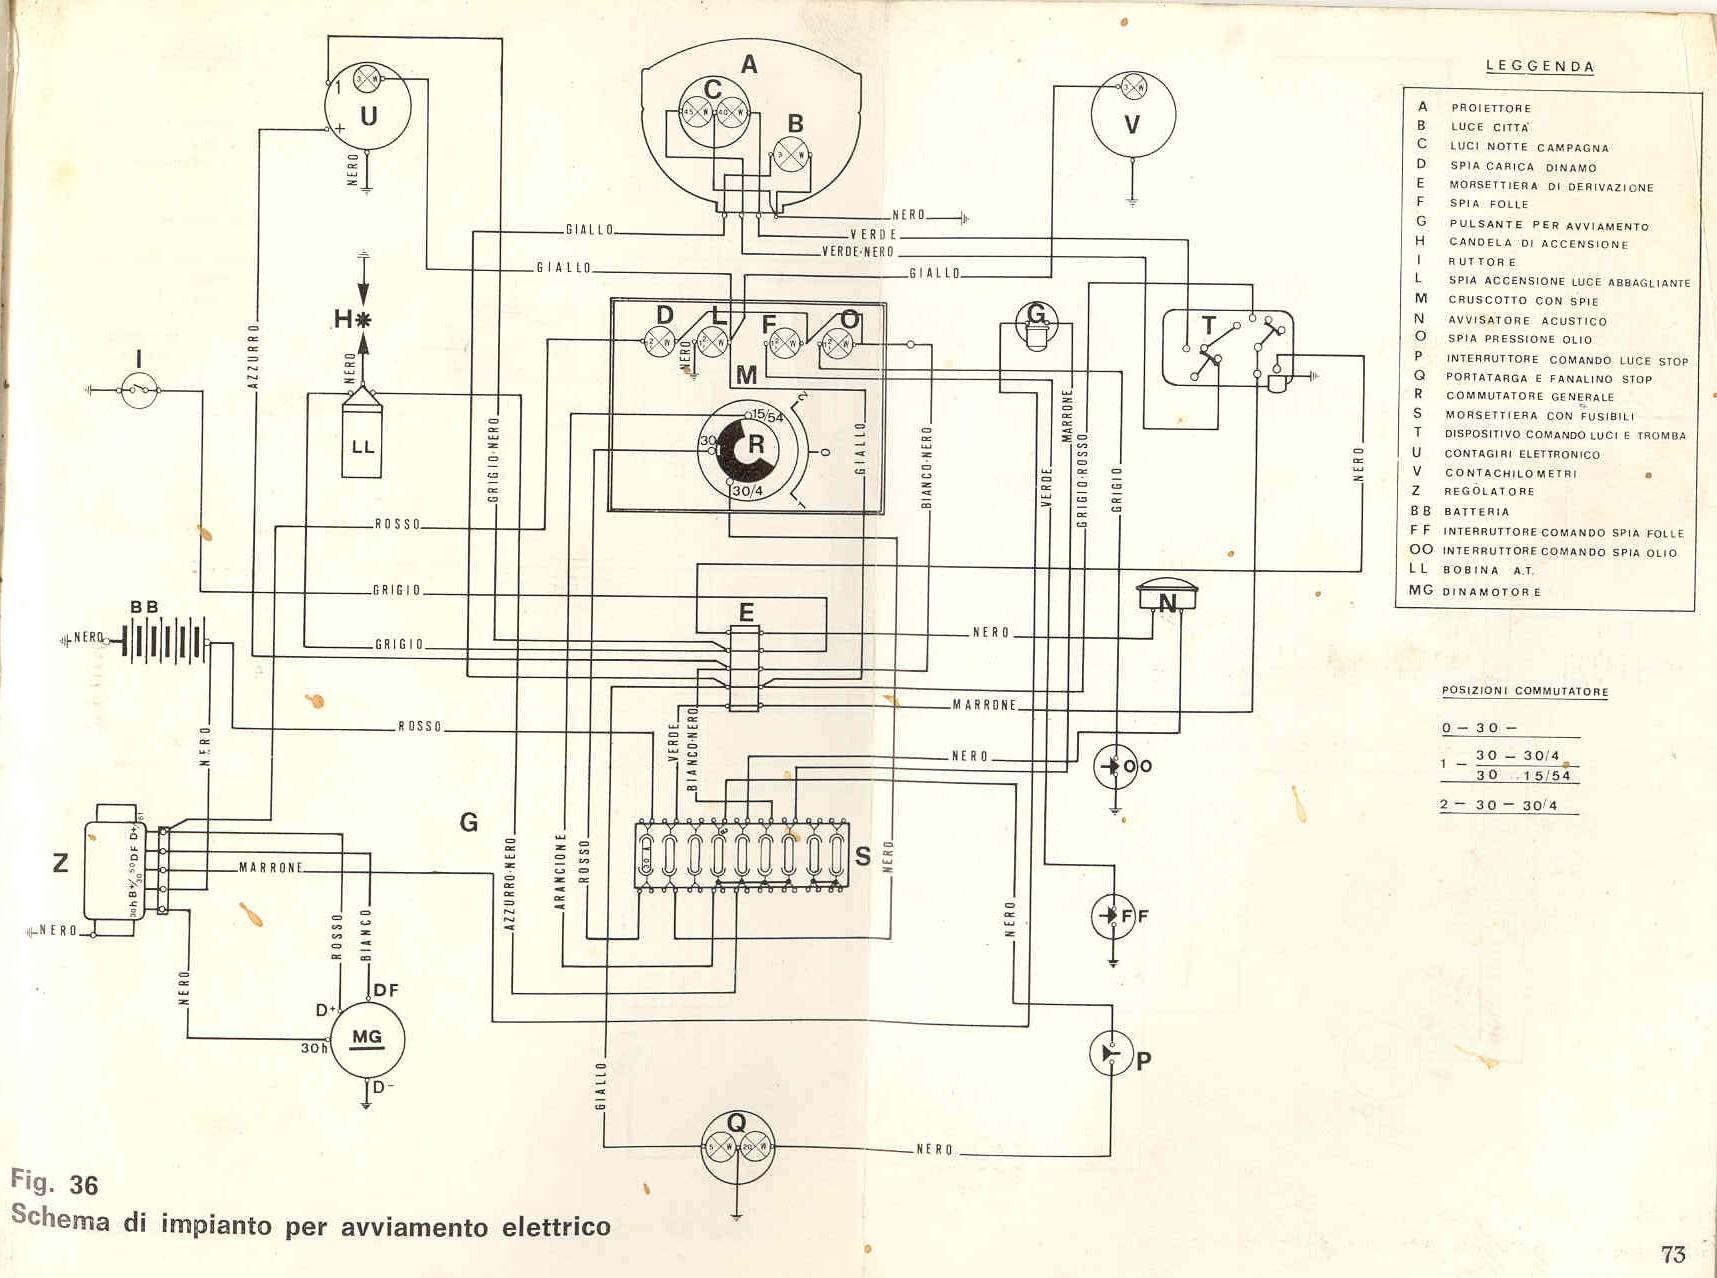 hight resolution of dynastarter wiringnuovofalcone com immagini civile avvelettrico 2 jpg